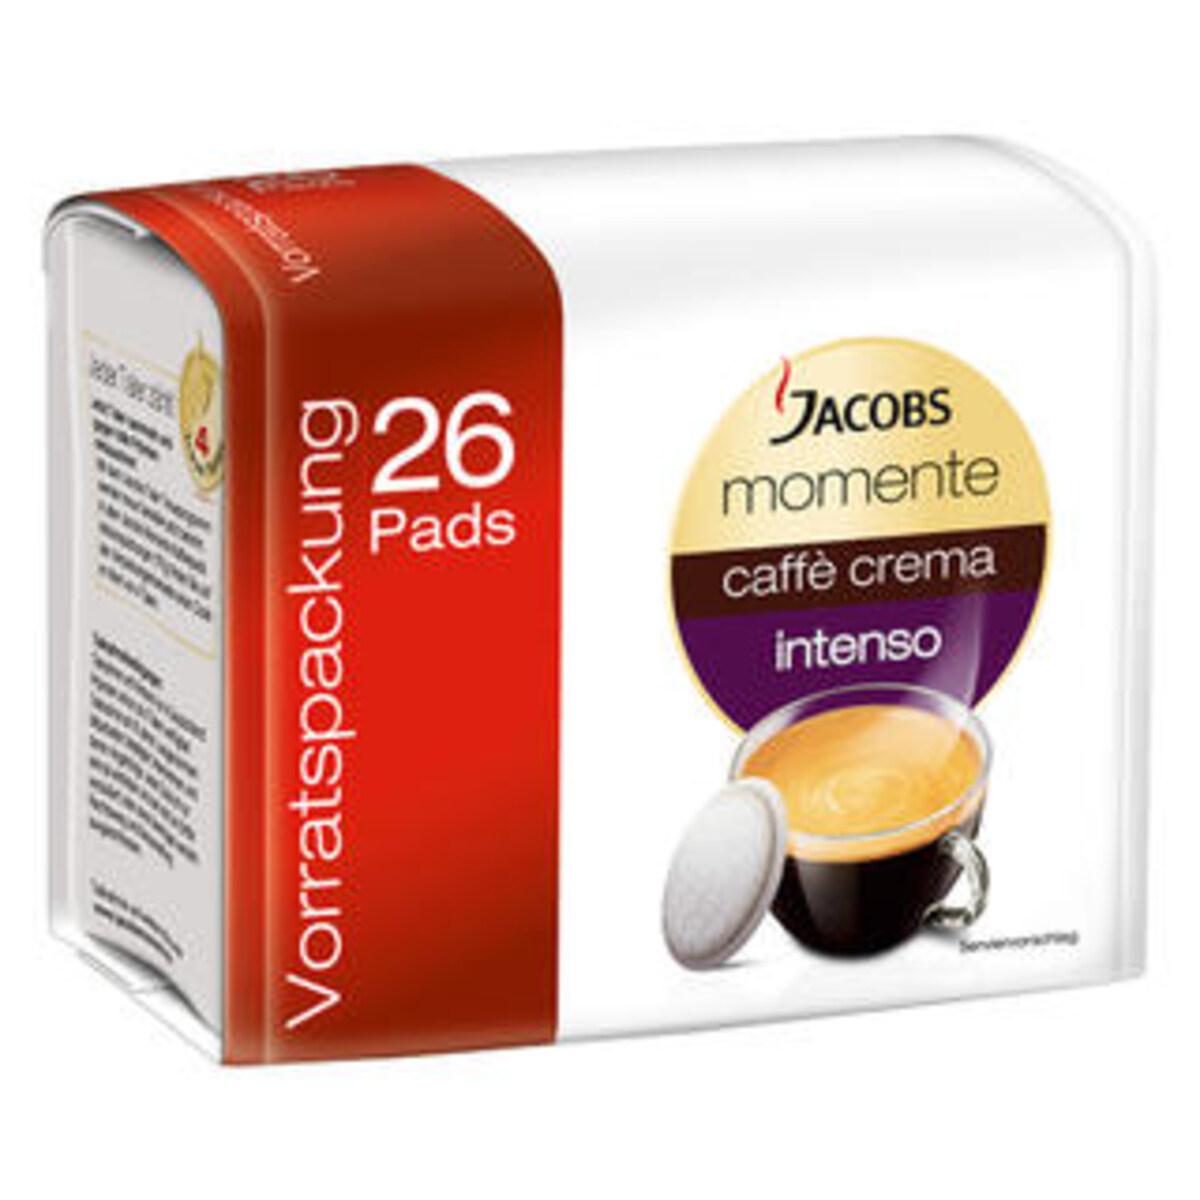 Jacobs Momente Caffе Crema Intenso - 26 дози